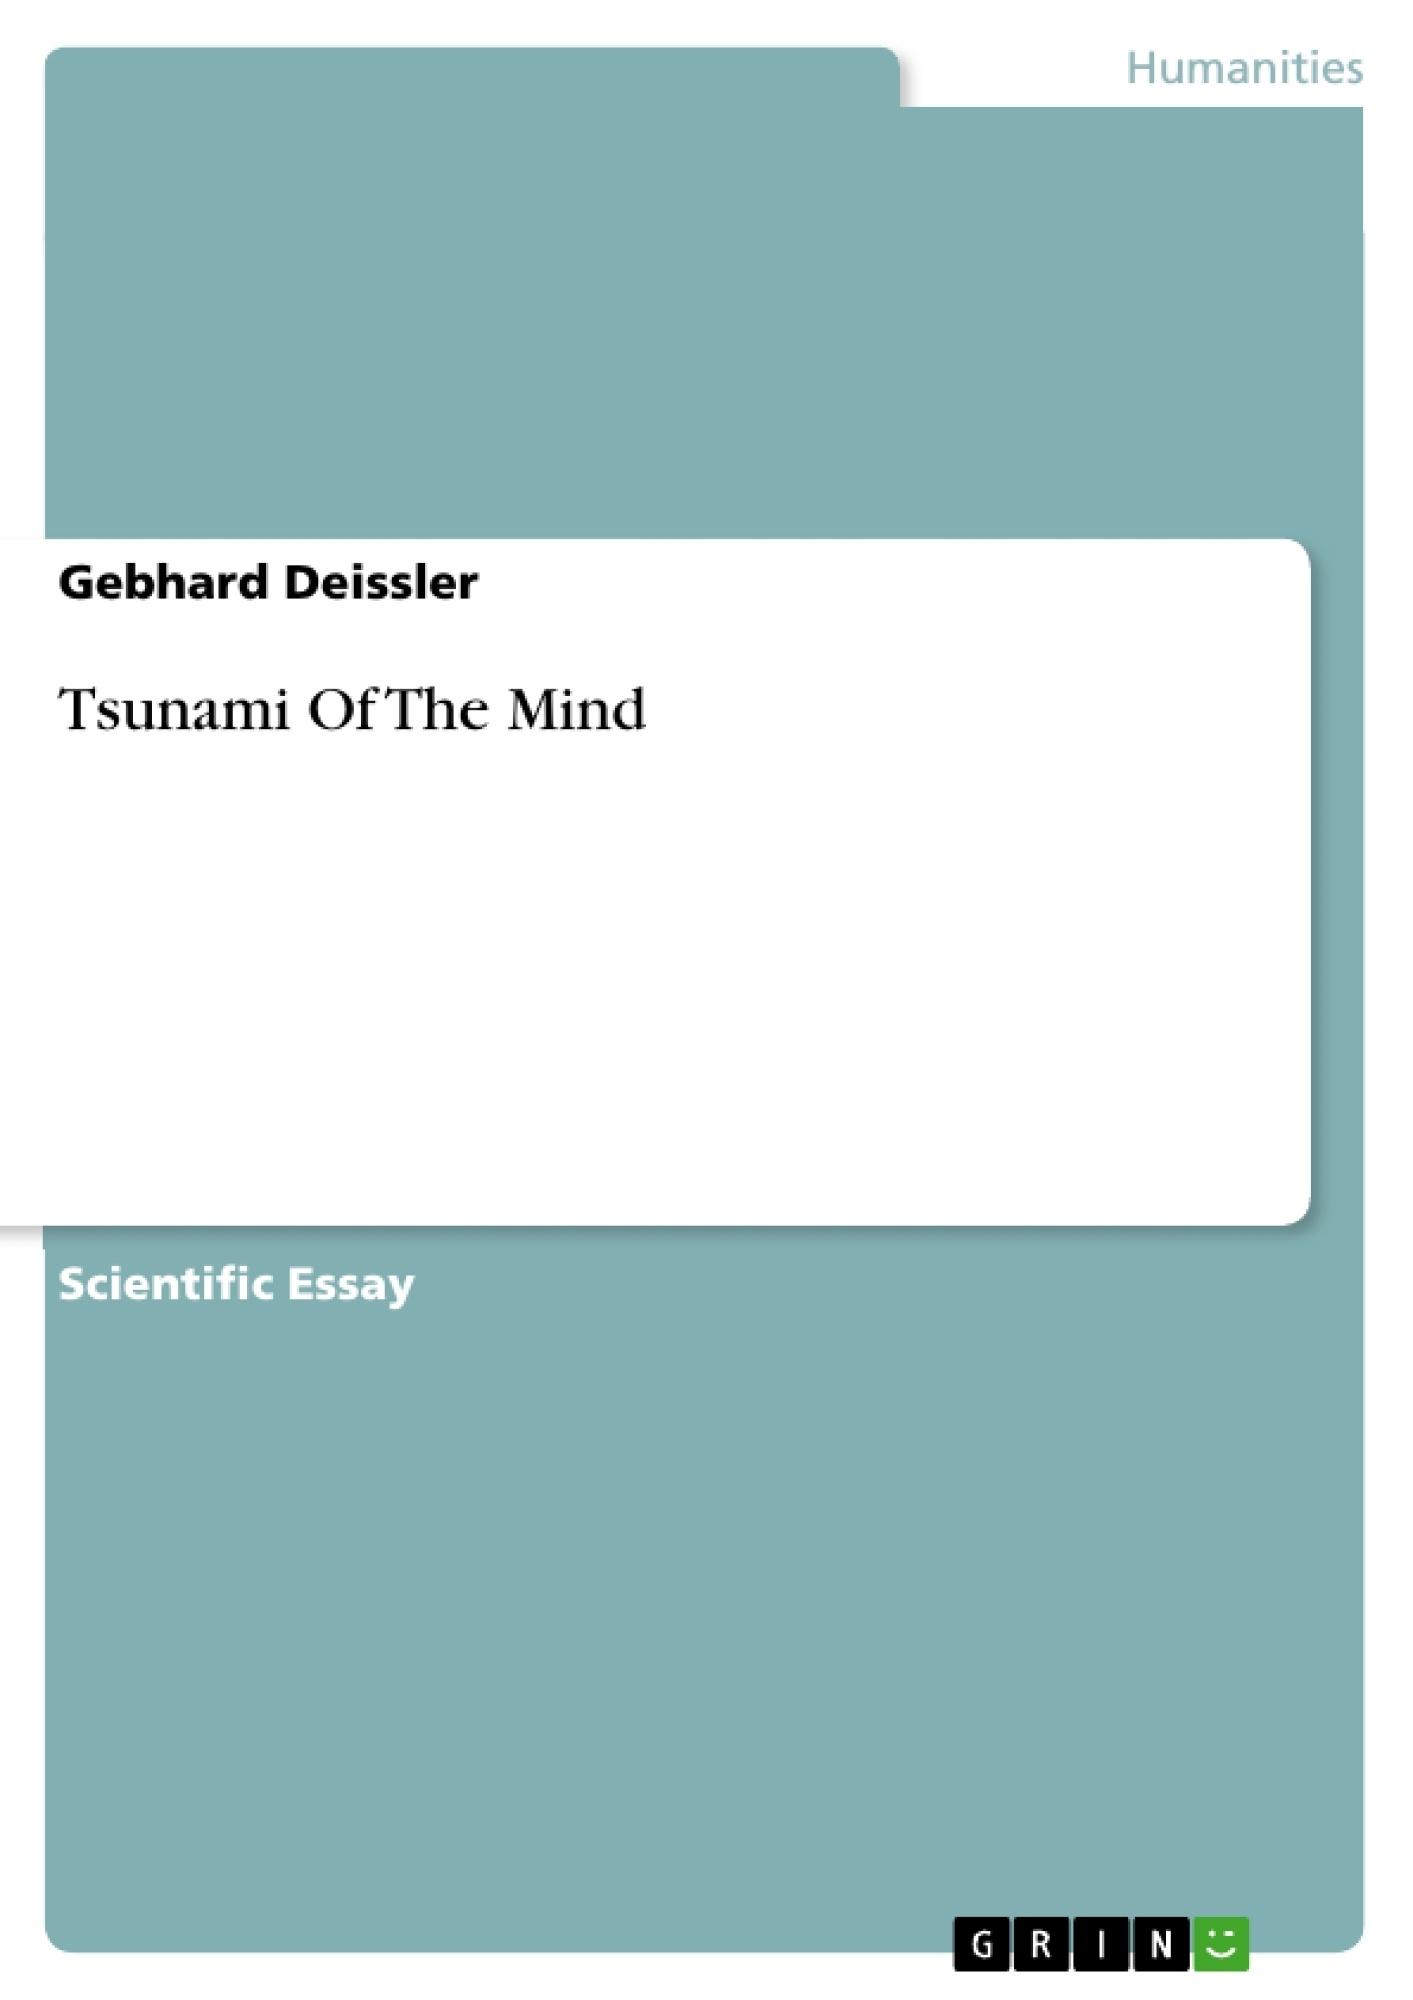 Title: Tsunami Of The Mind